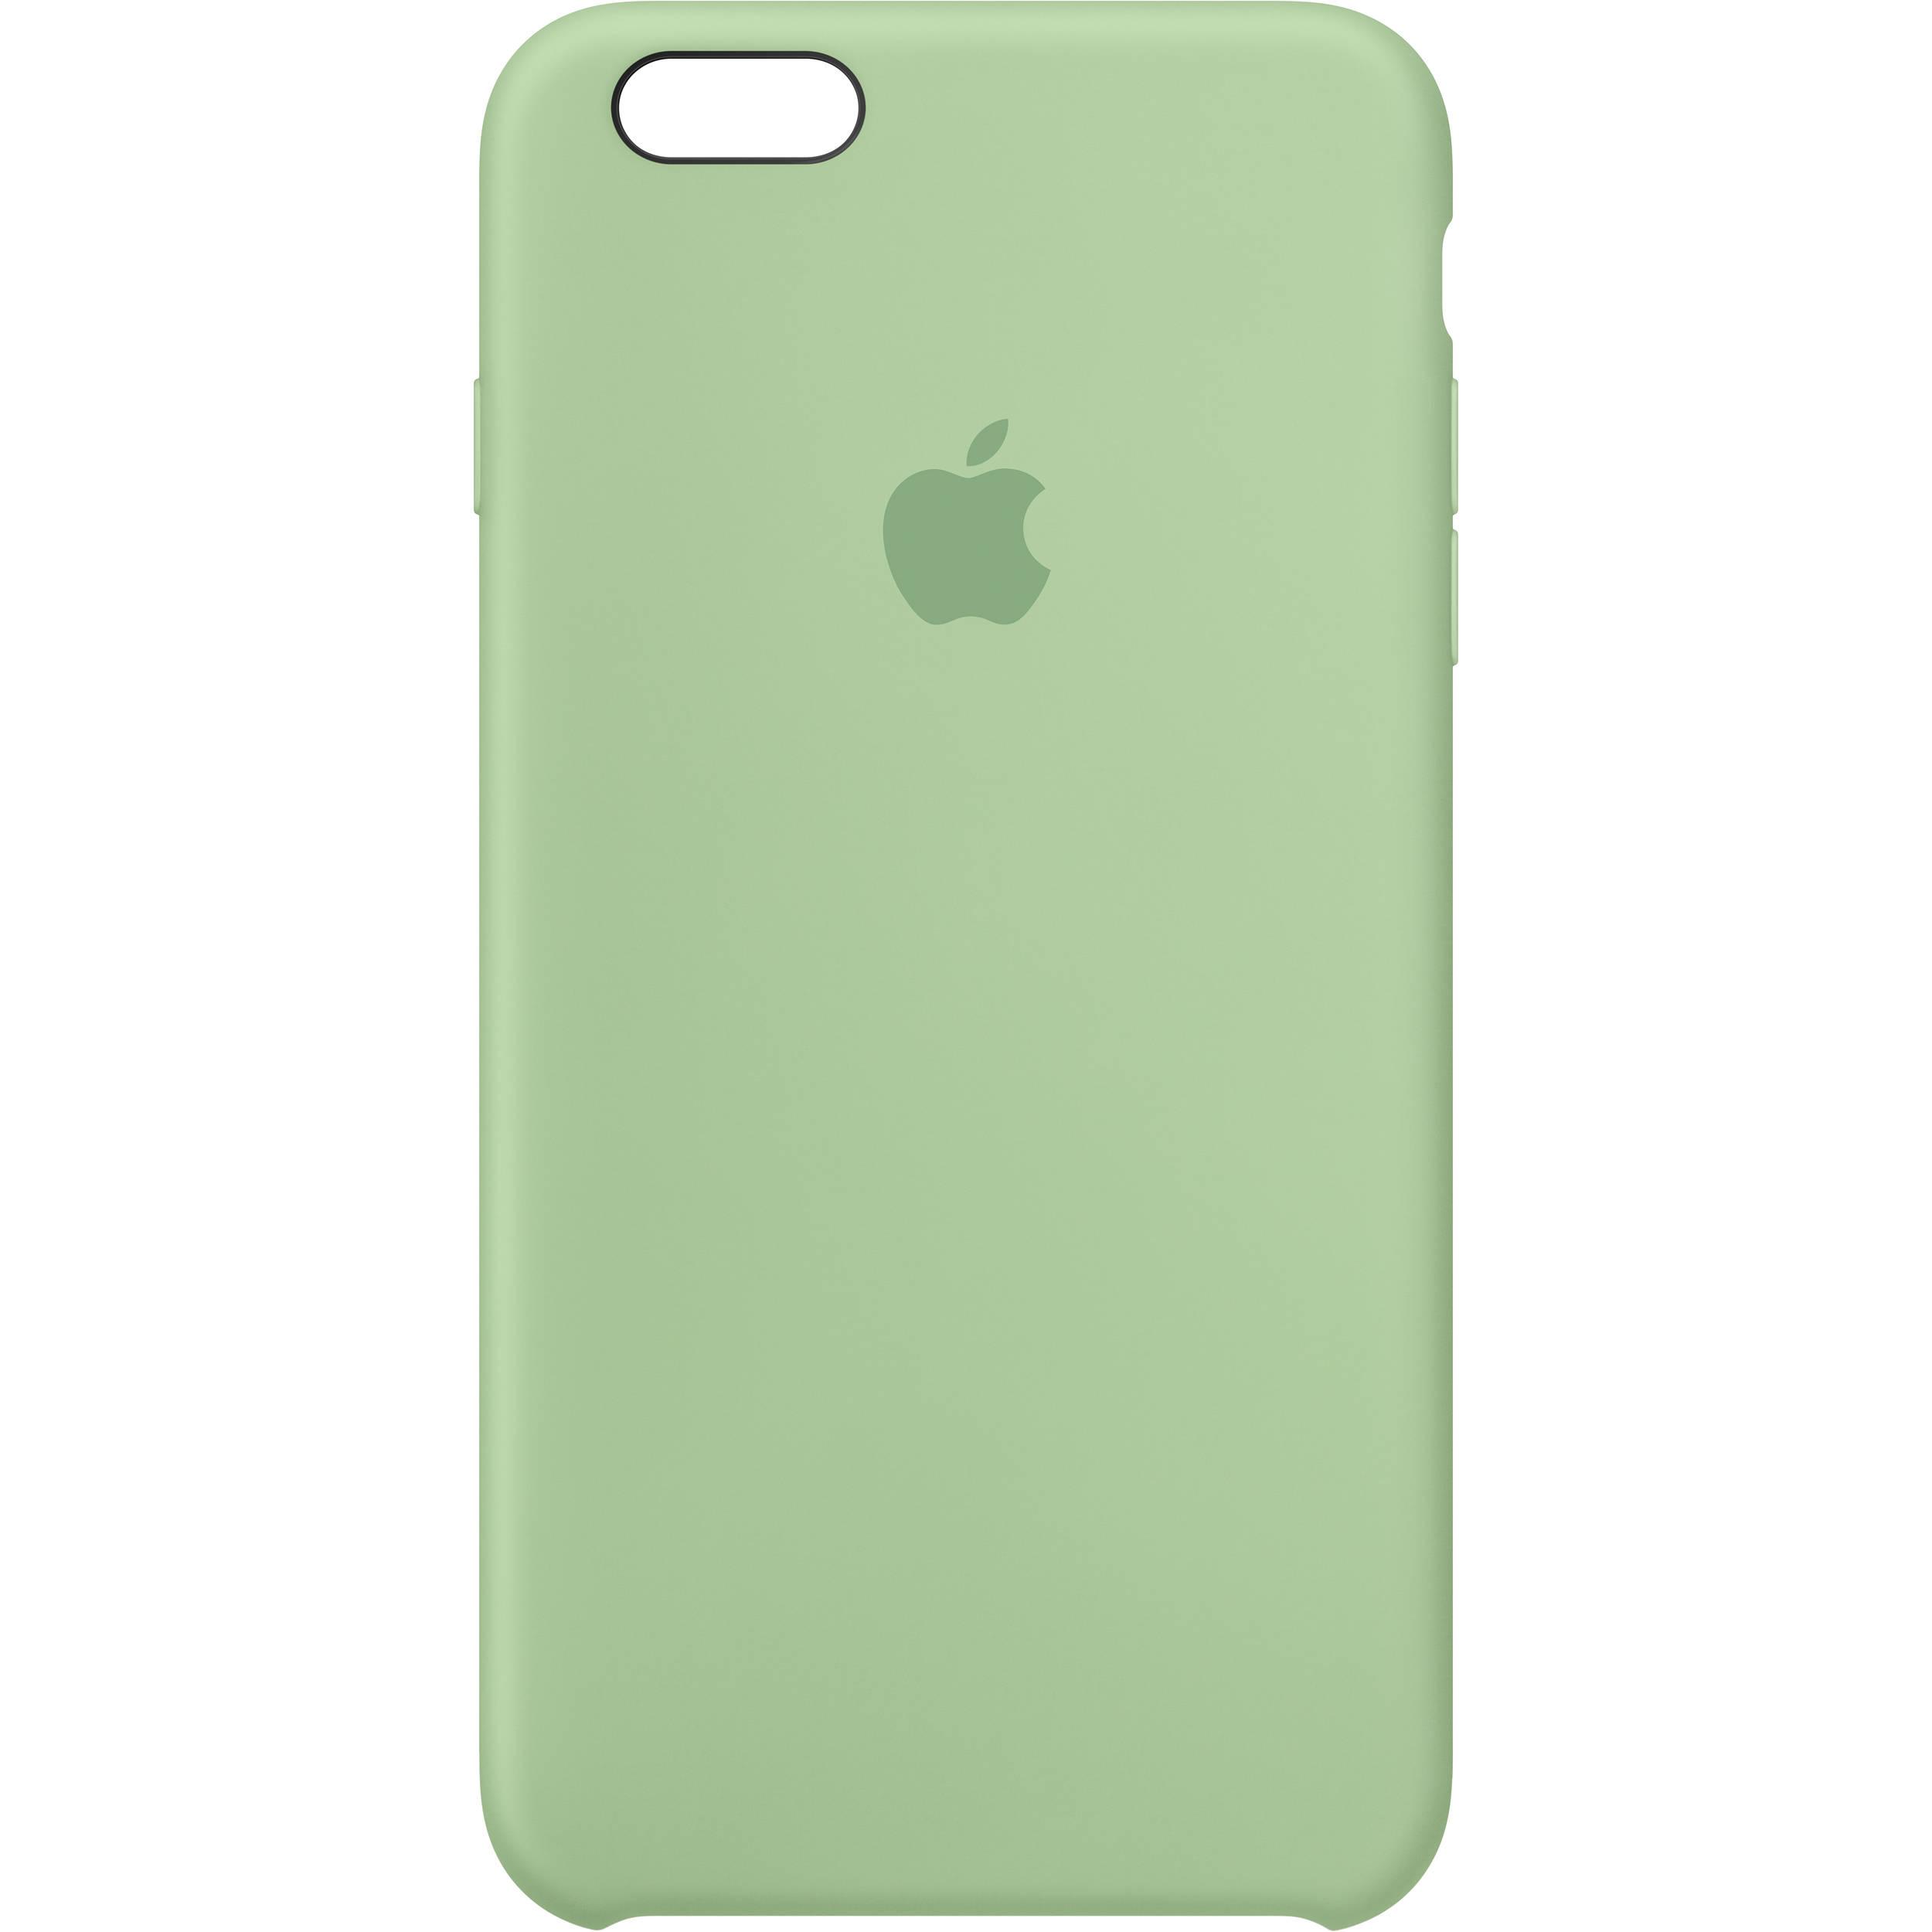 silicone iphone 6 case